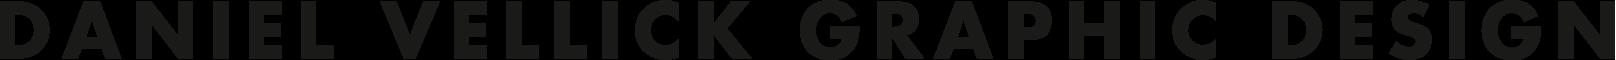 DANIEL VELLICK GRAPHIC DESIGN | Grafikdesign Graz